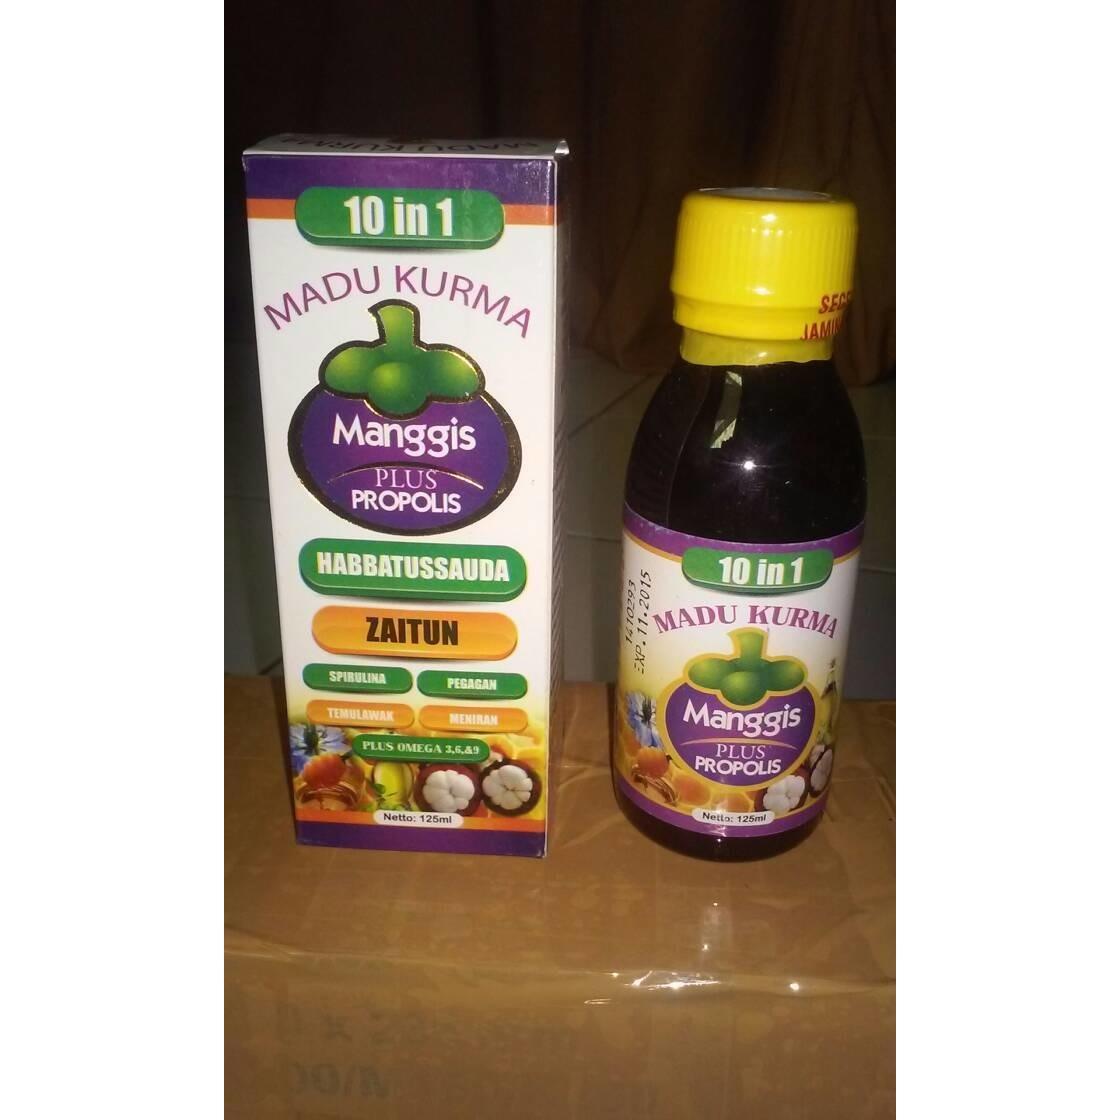 List Harga Obat Herbal Xamthone Terbaru Mei 2018 350ml Original Promo Madu Kurma Manggis Plus Propolis